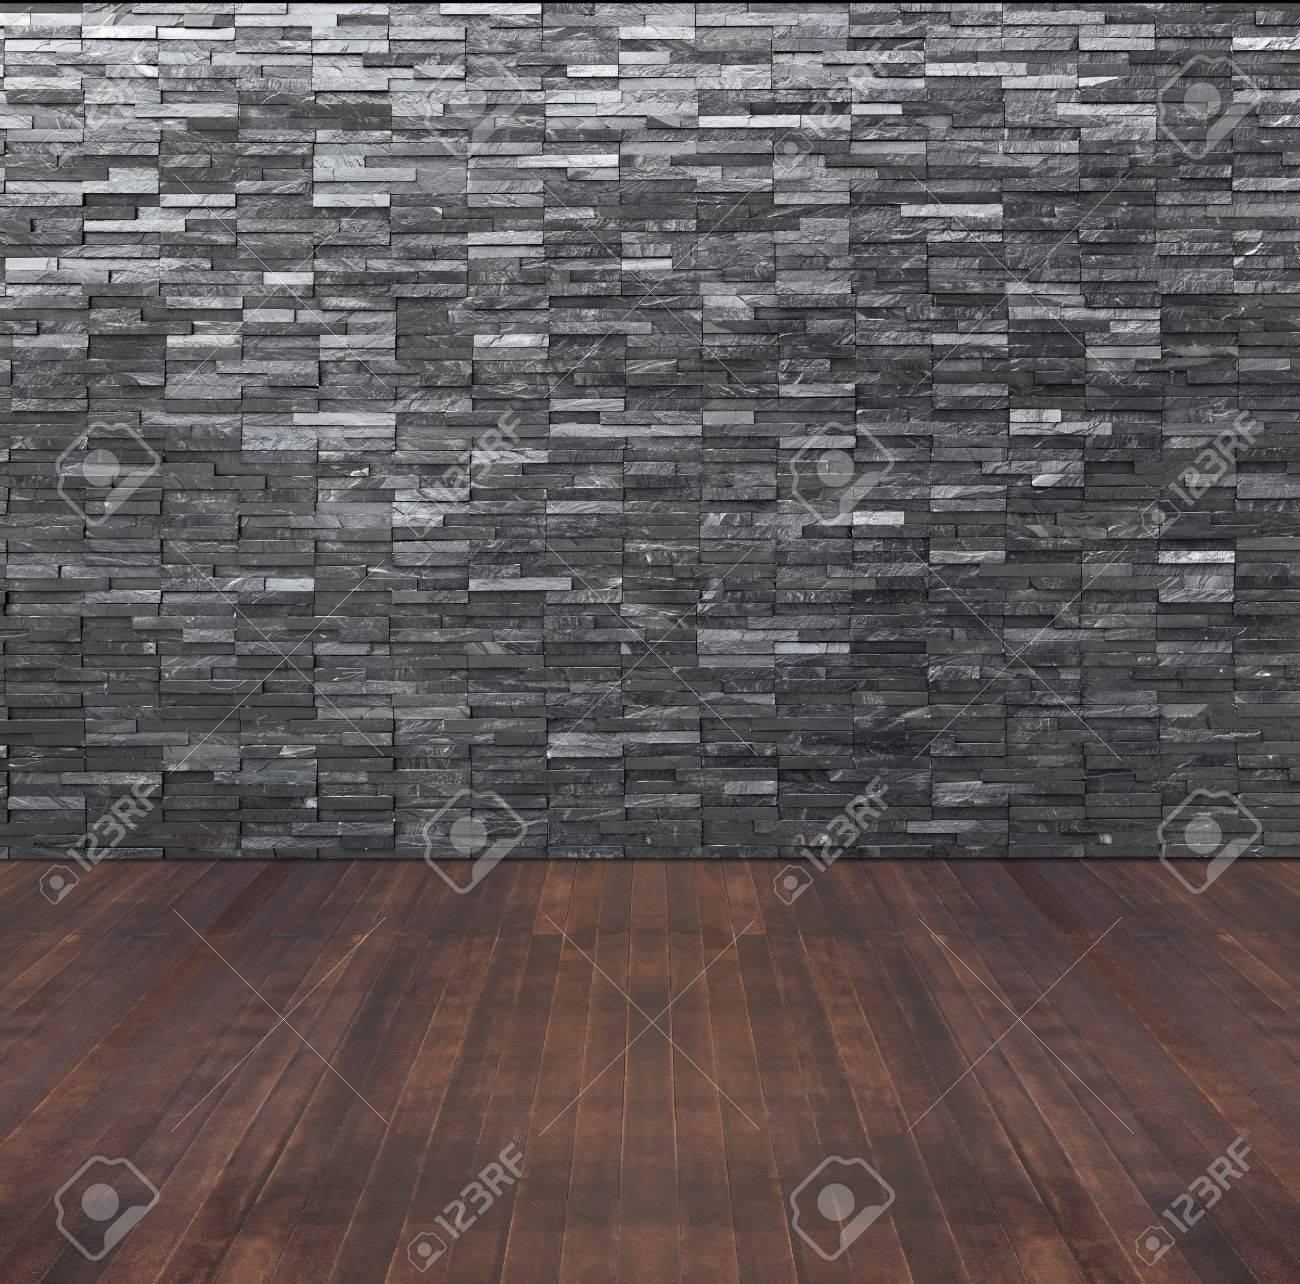 slate floor texture. Empty Room Interior With Black Slate Wall And Wooden Floor Stock Photo - 59836332 Texture